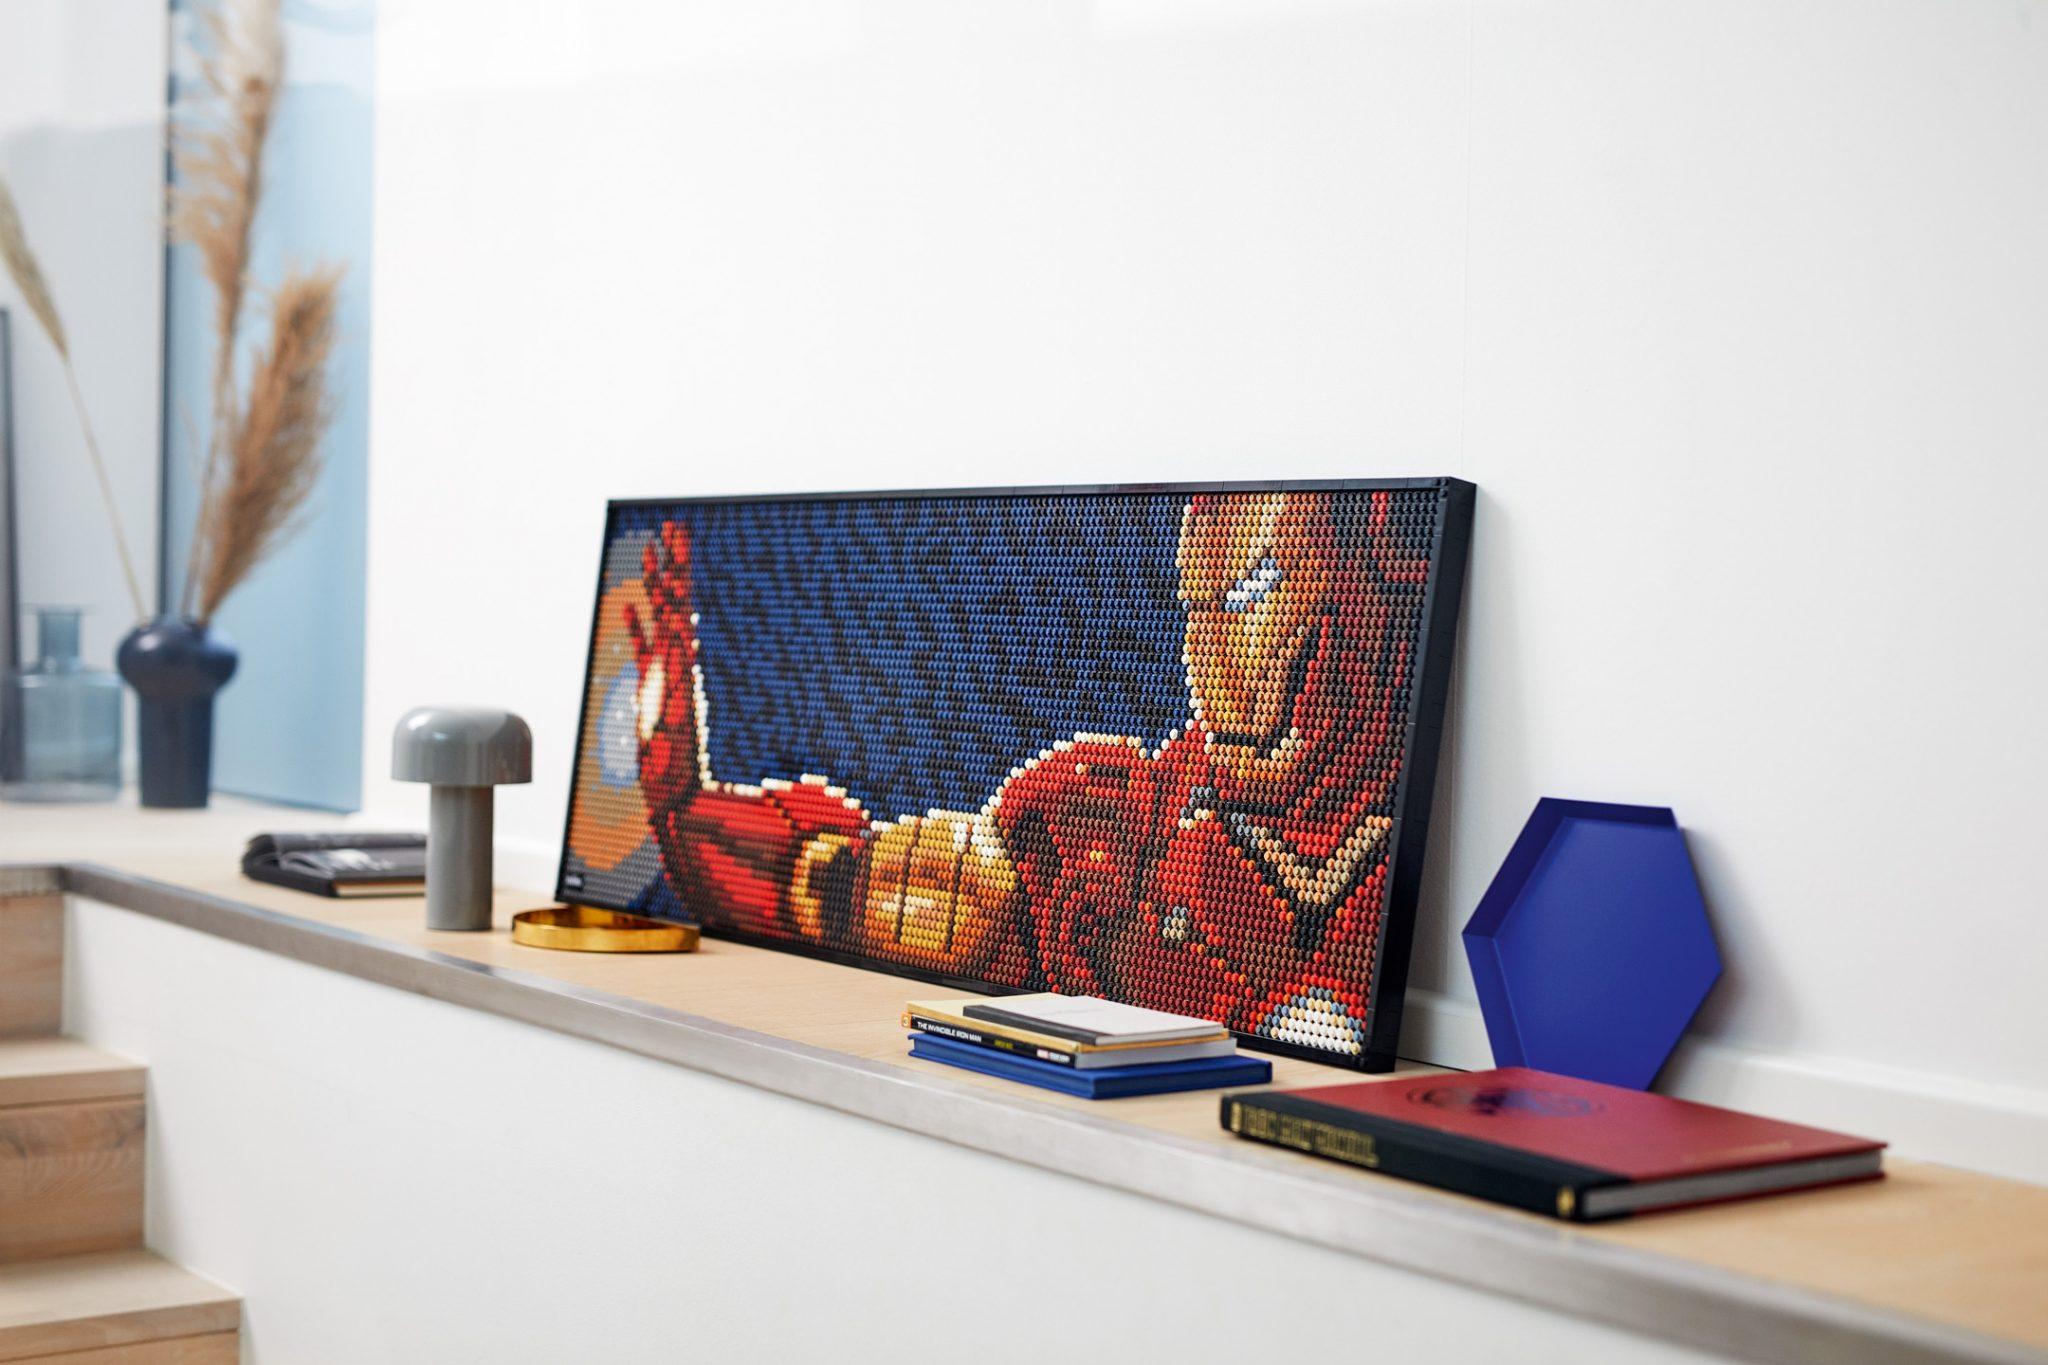 LEGO-Art-31199-Marvel-Studios-Iron-Man-GV2L4-16-2048x1365.jpg